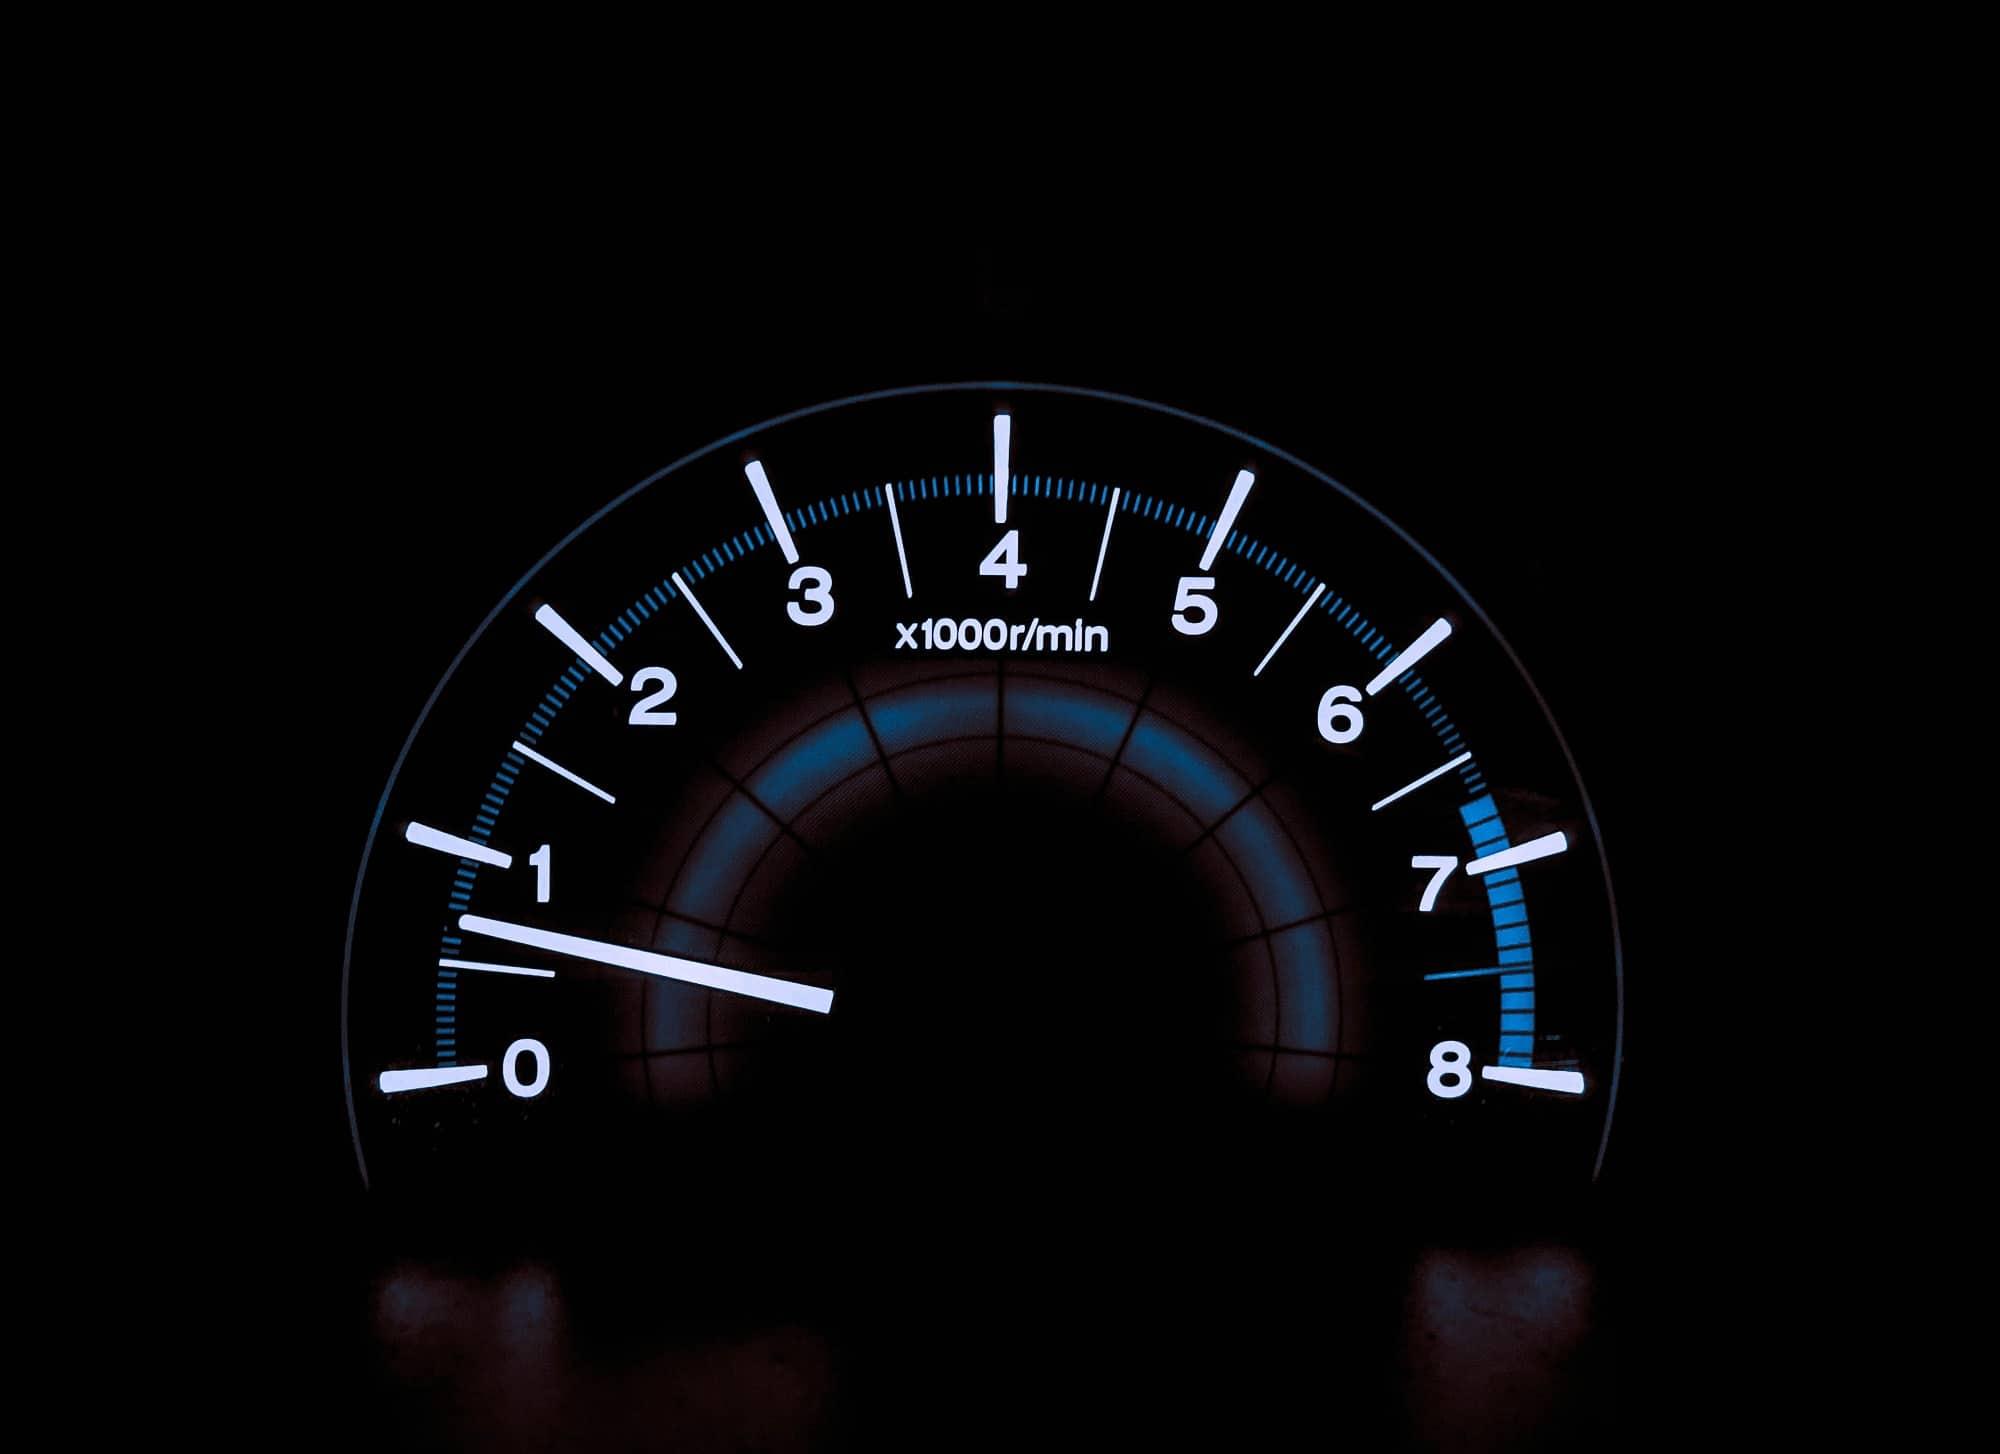 Is Your Magento 2 Site Running at Optimum Speed?